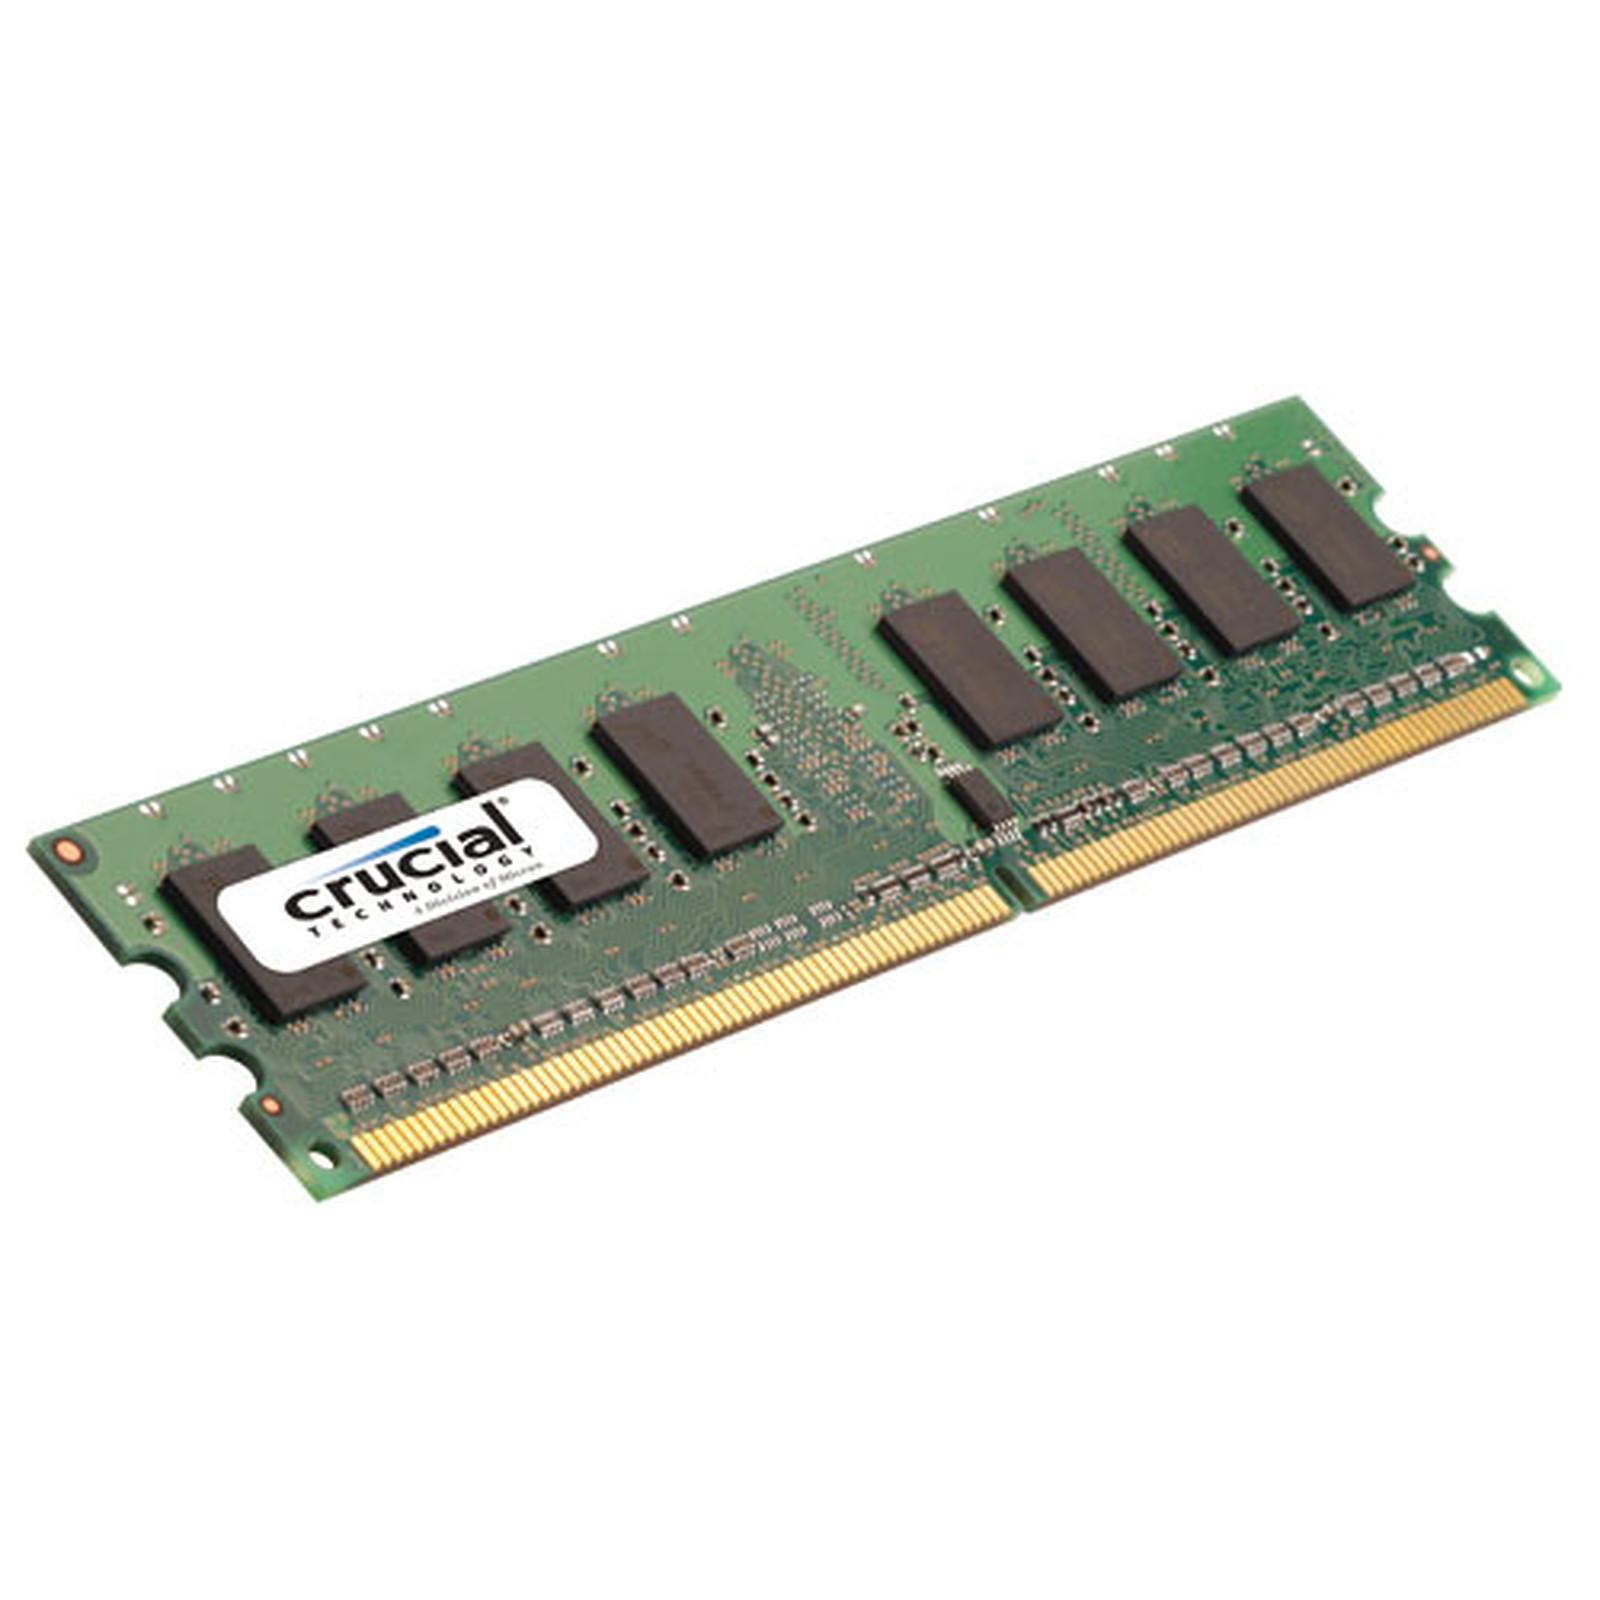 Crucial 2 Go DDR2 667 MHz CL5